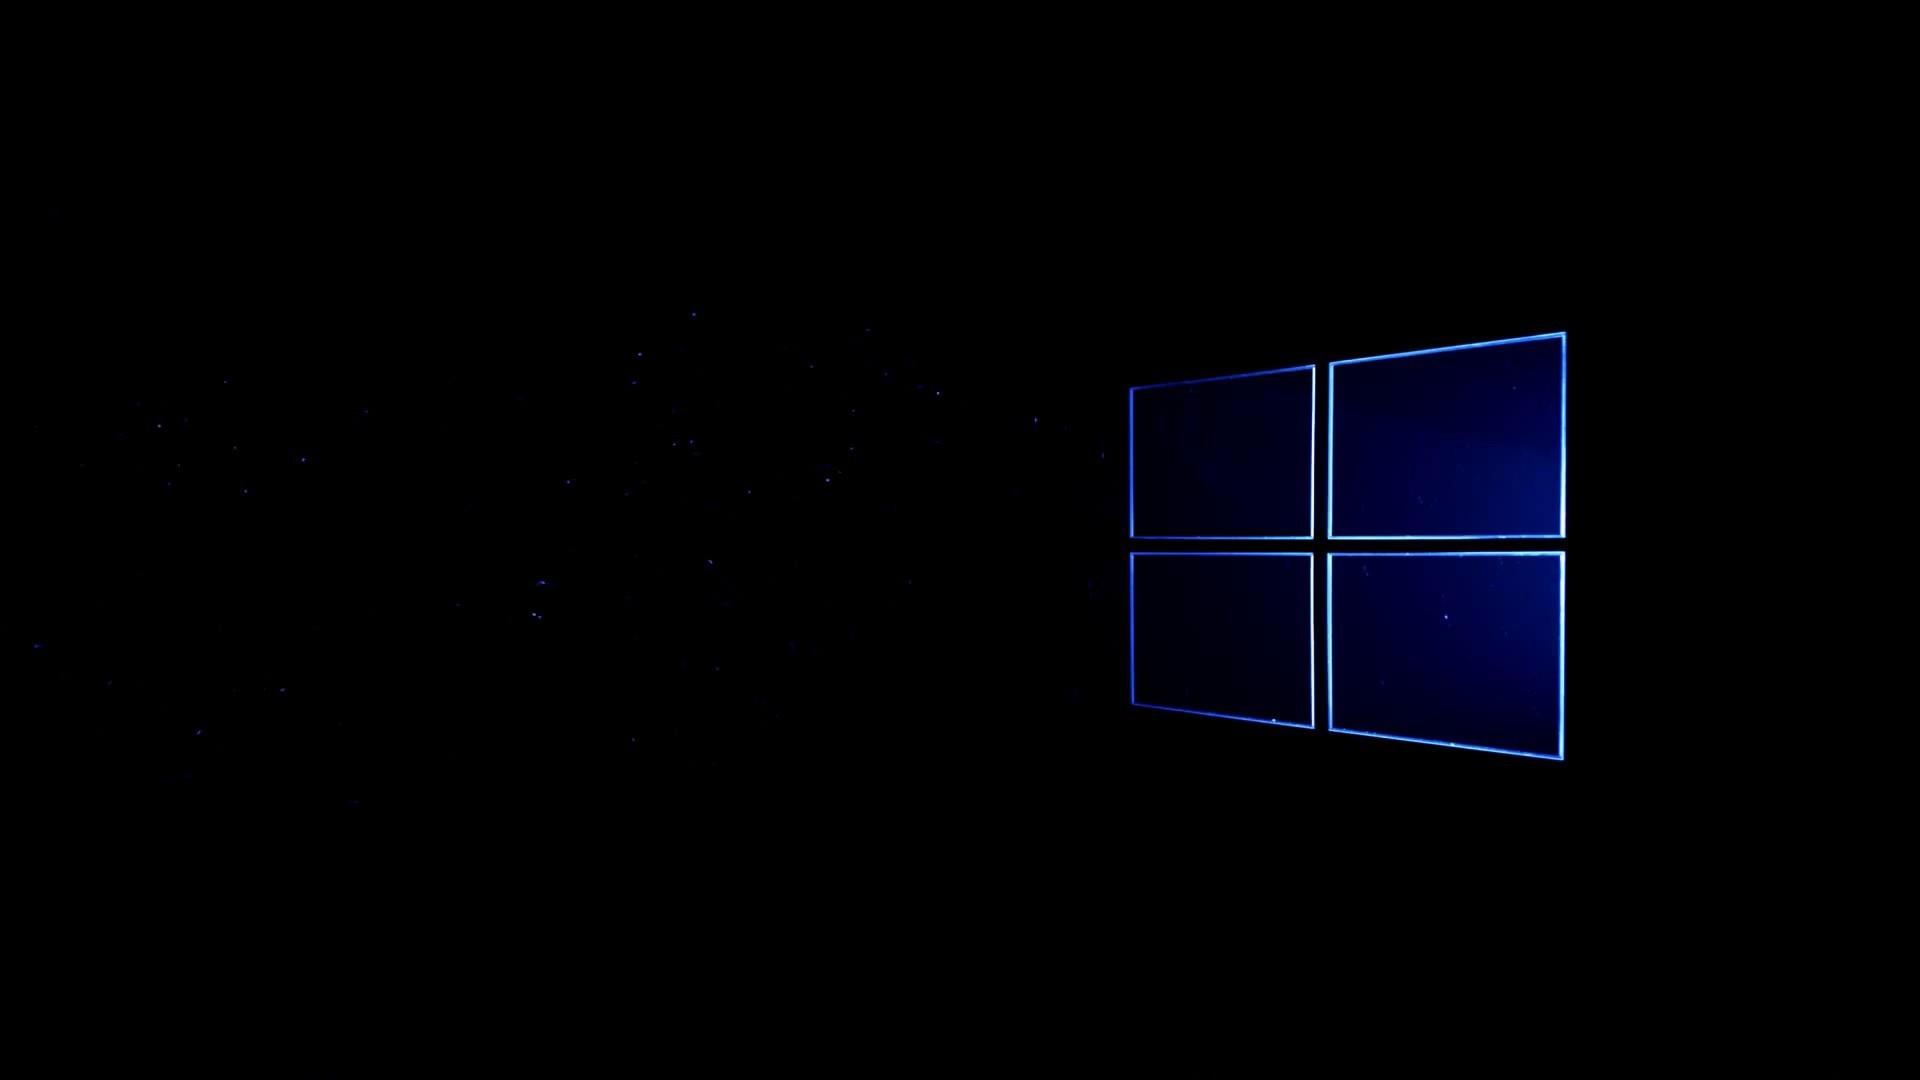 Explore Windows 10, Wallpaper For, and more! Microsoft Wallpaper HD